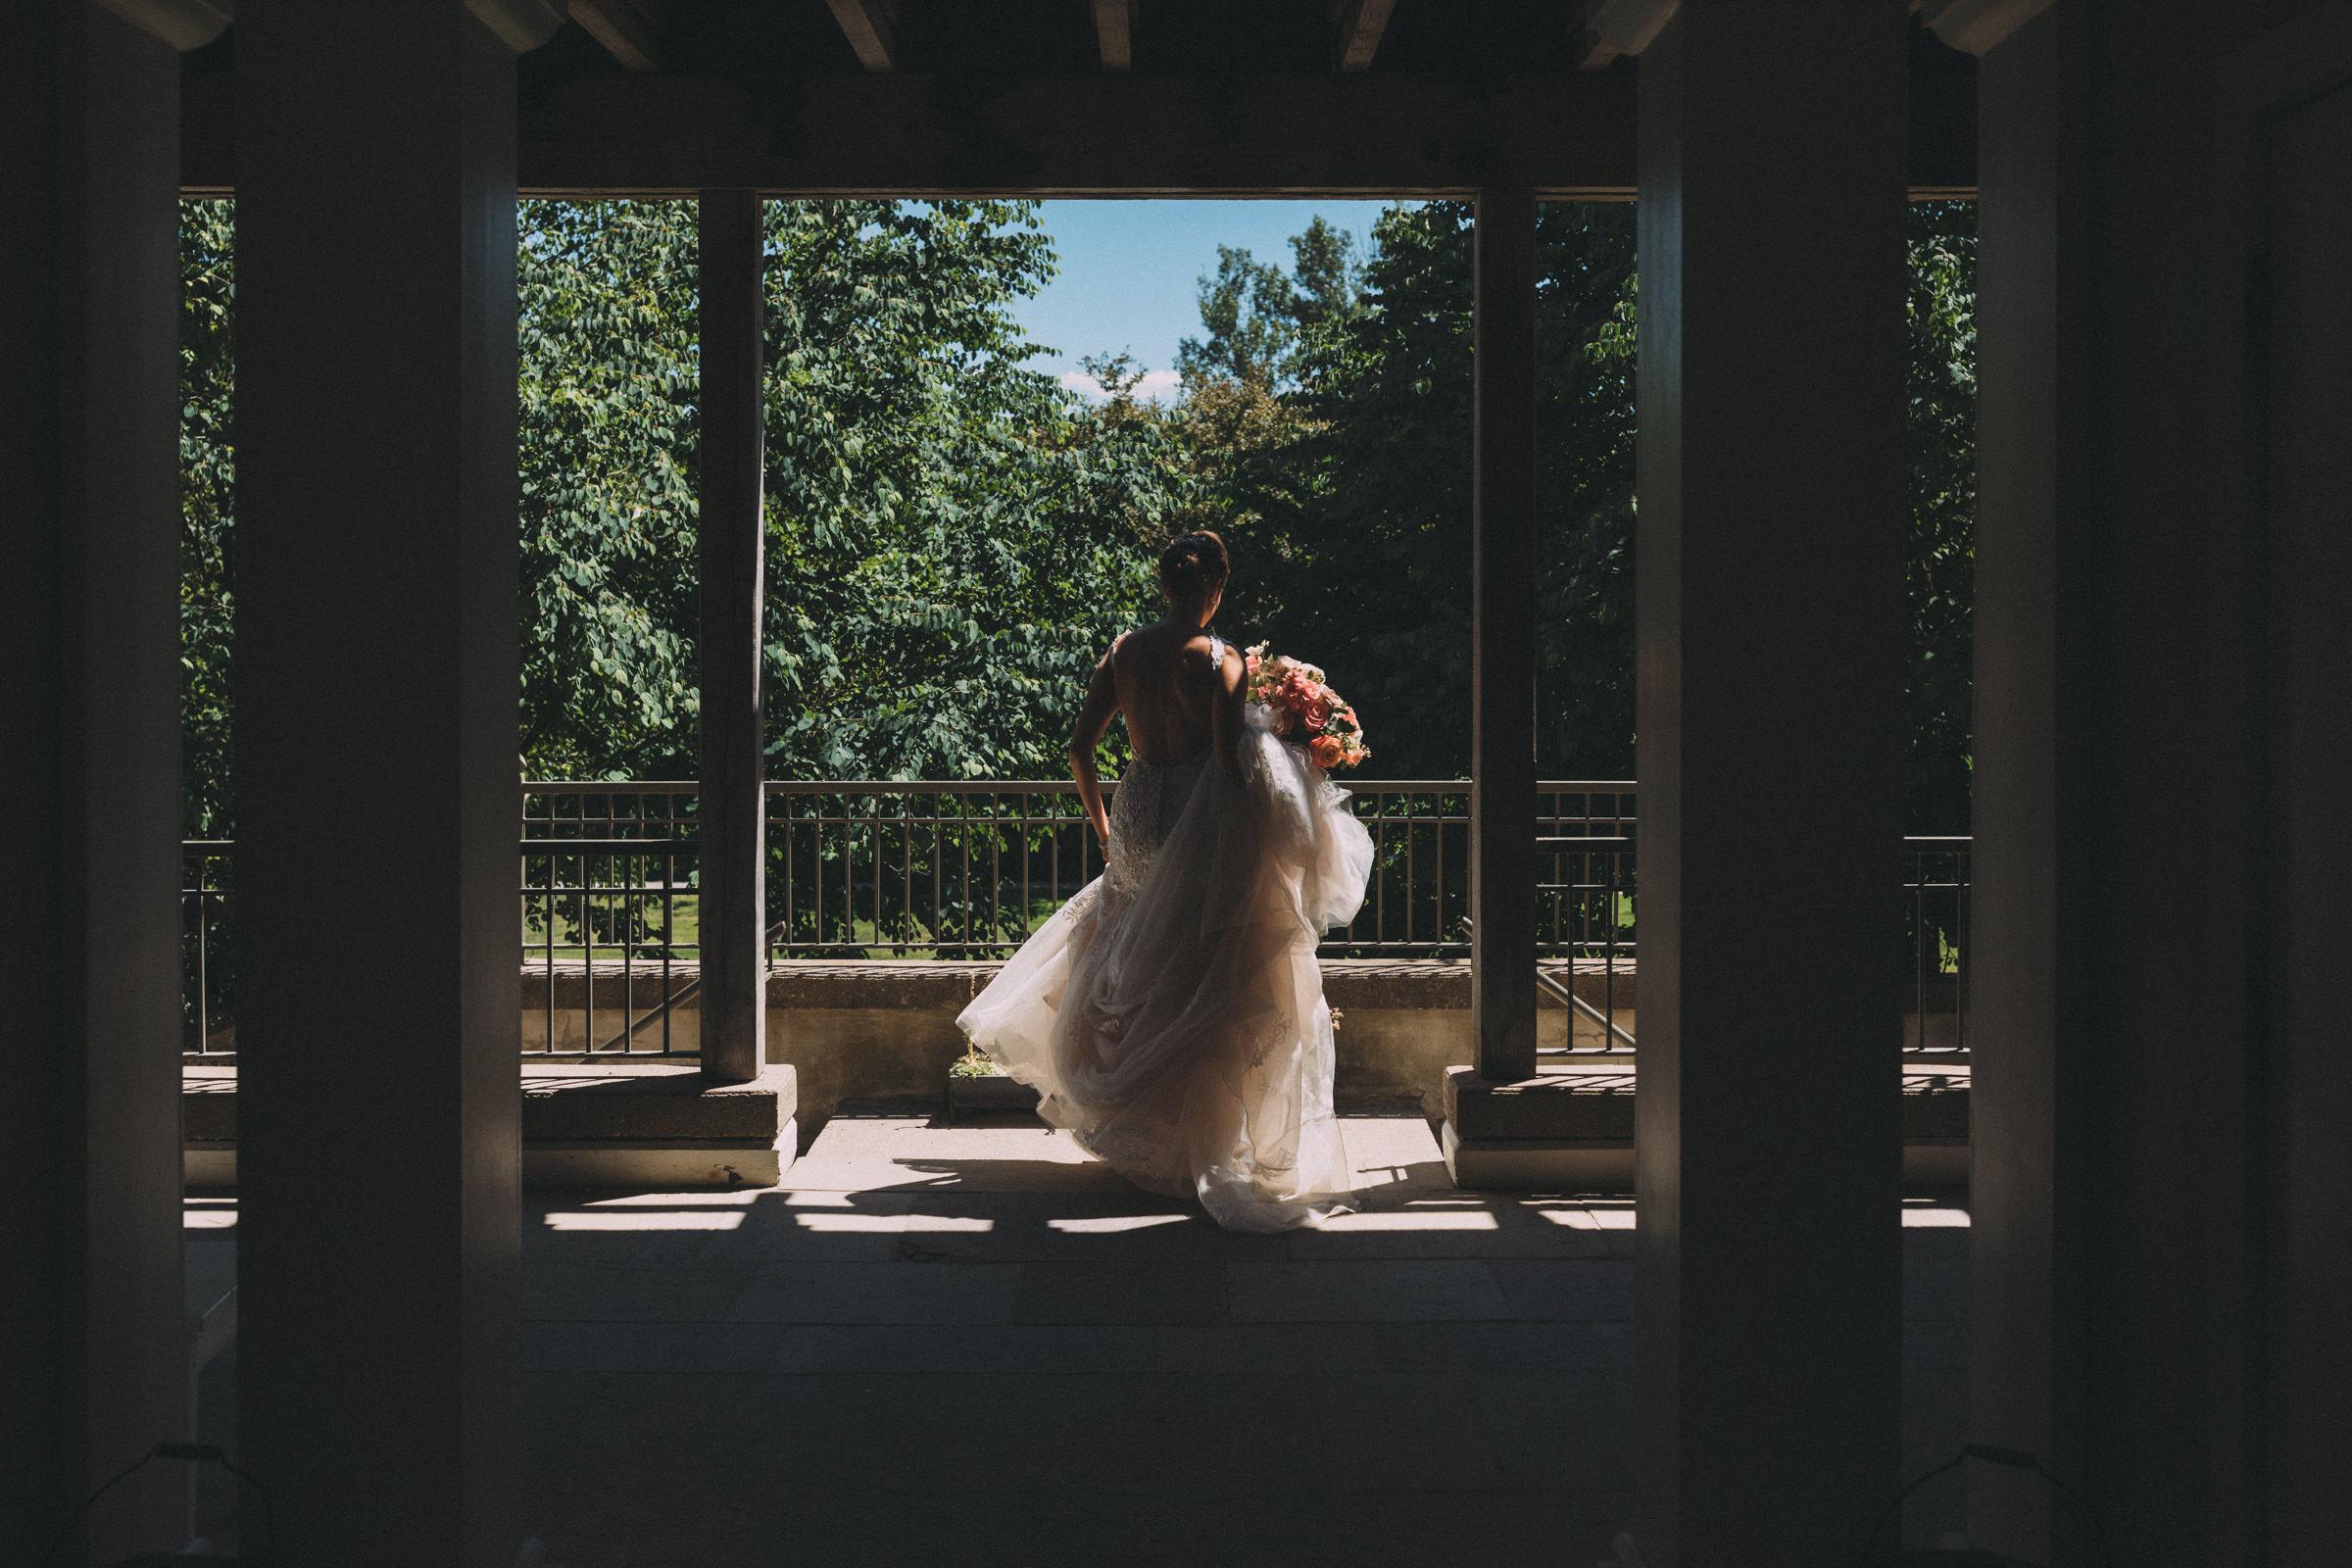 Langdon-Hall-wedding-photography-Cambridge-by-Sam-Wong-of-Visual-Cravings_Sarah-Ryan_16.jpg